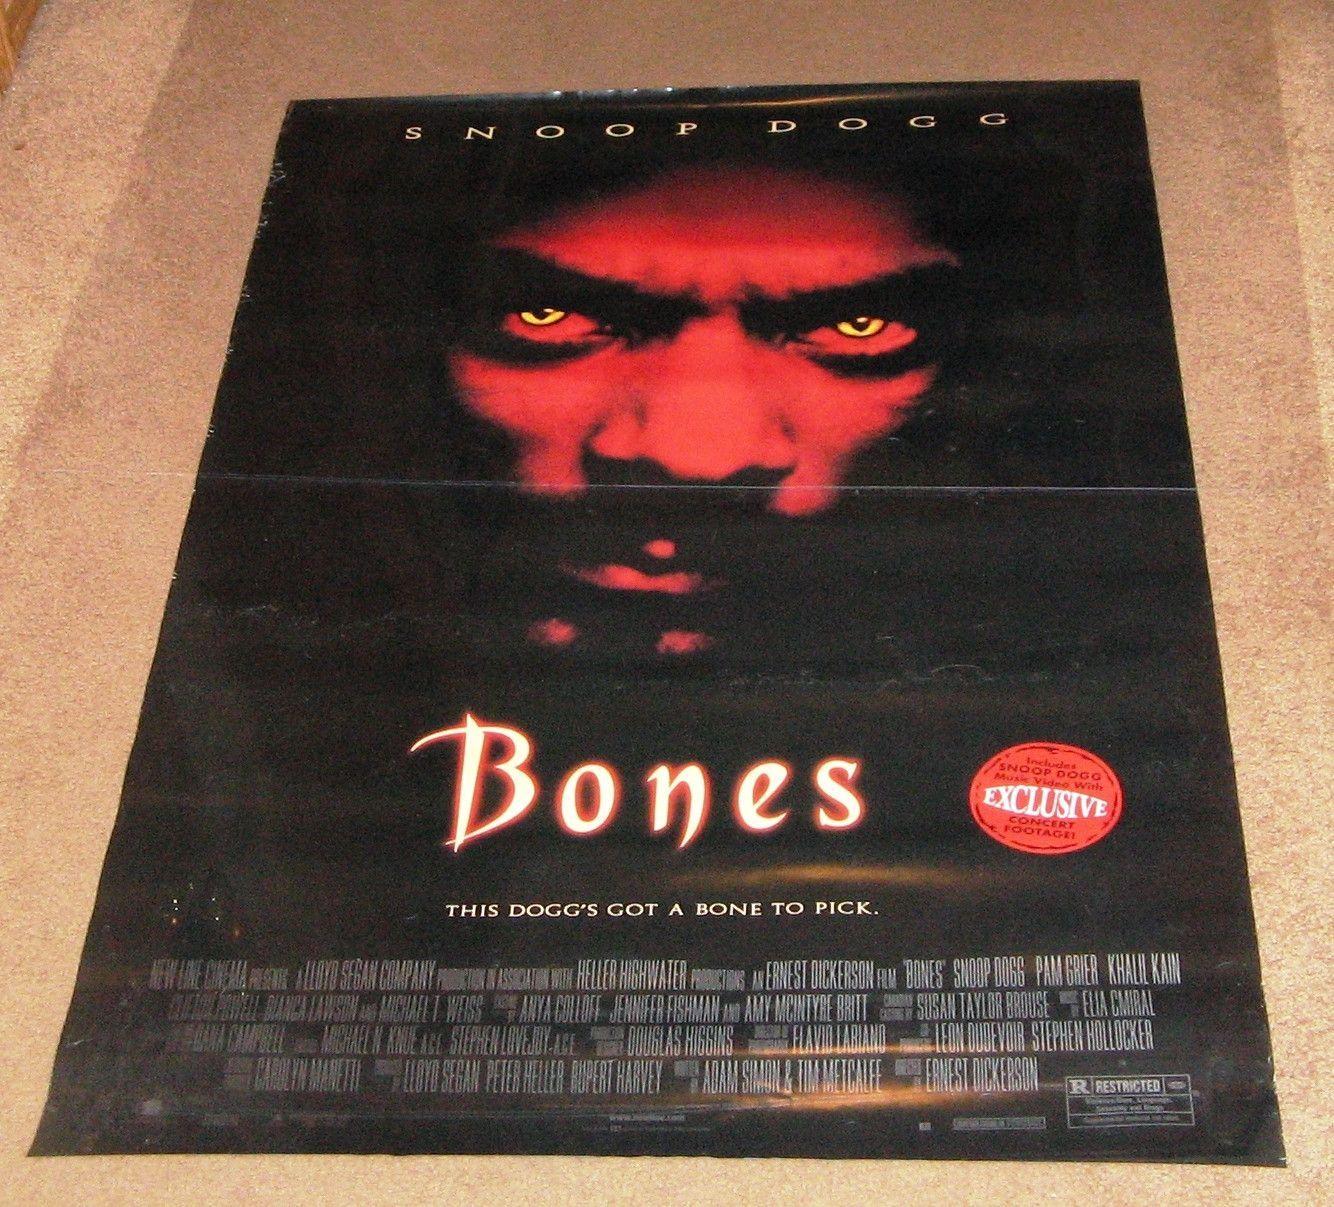 Bones Movie Poster 27x40 Used Snoop Dogg